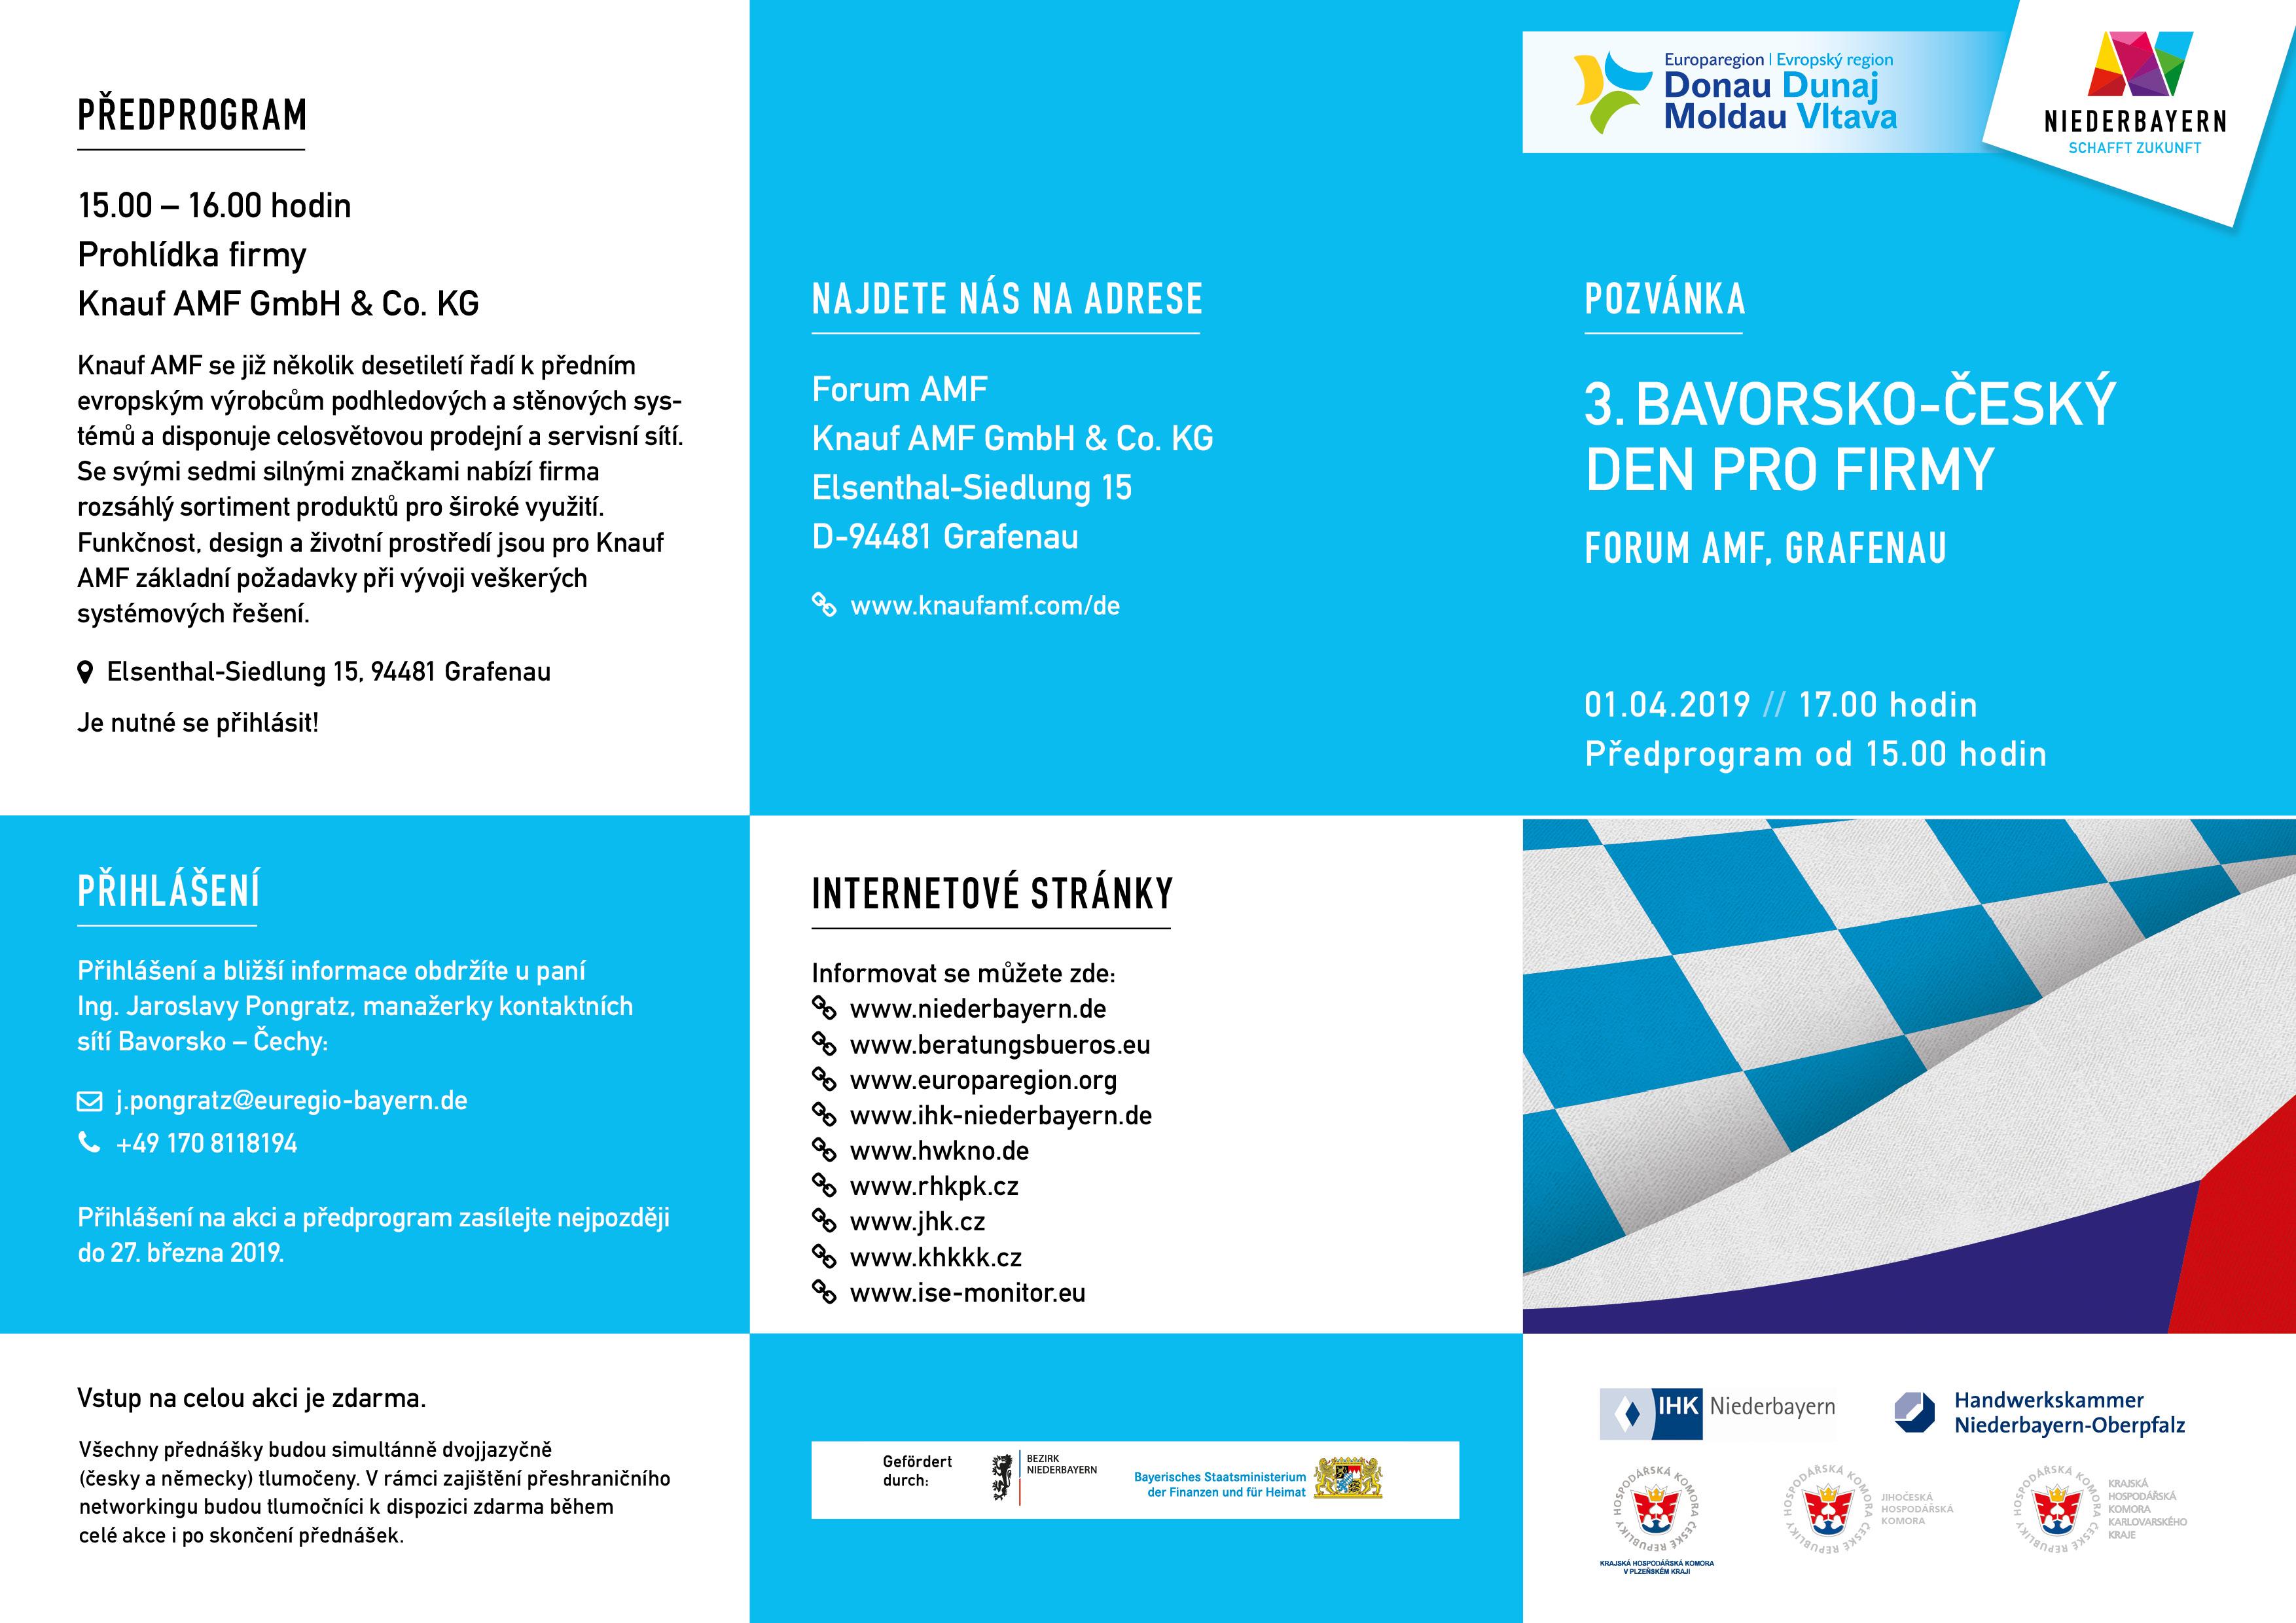 3-bavorsko-cesky-den-pro-firmy_pozvanka1